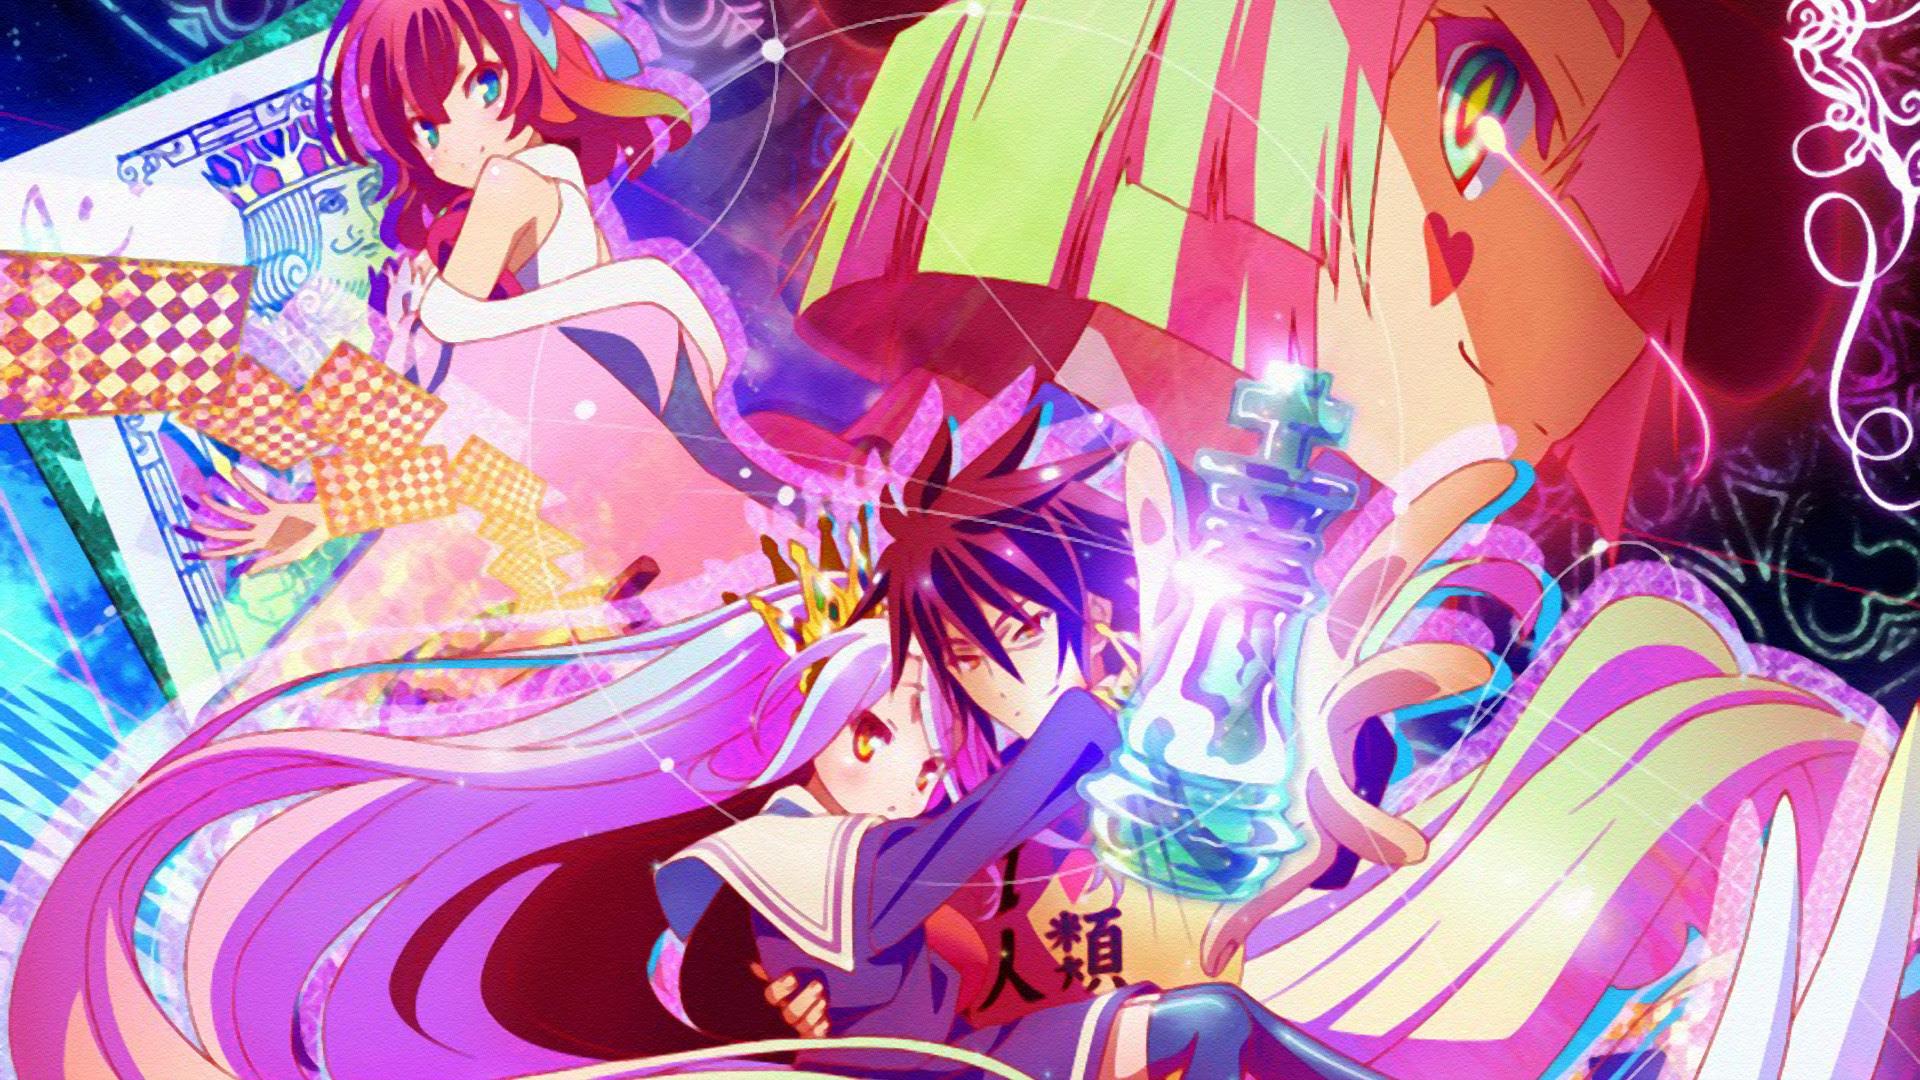 Anime Live Wallpapers for Desktop (62+ images)